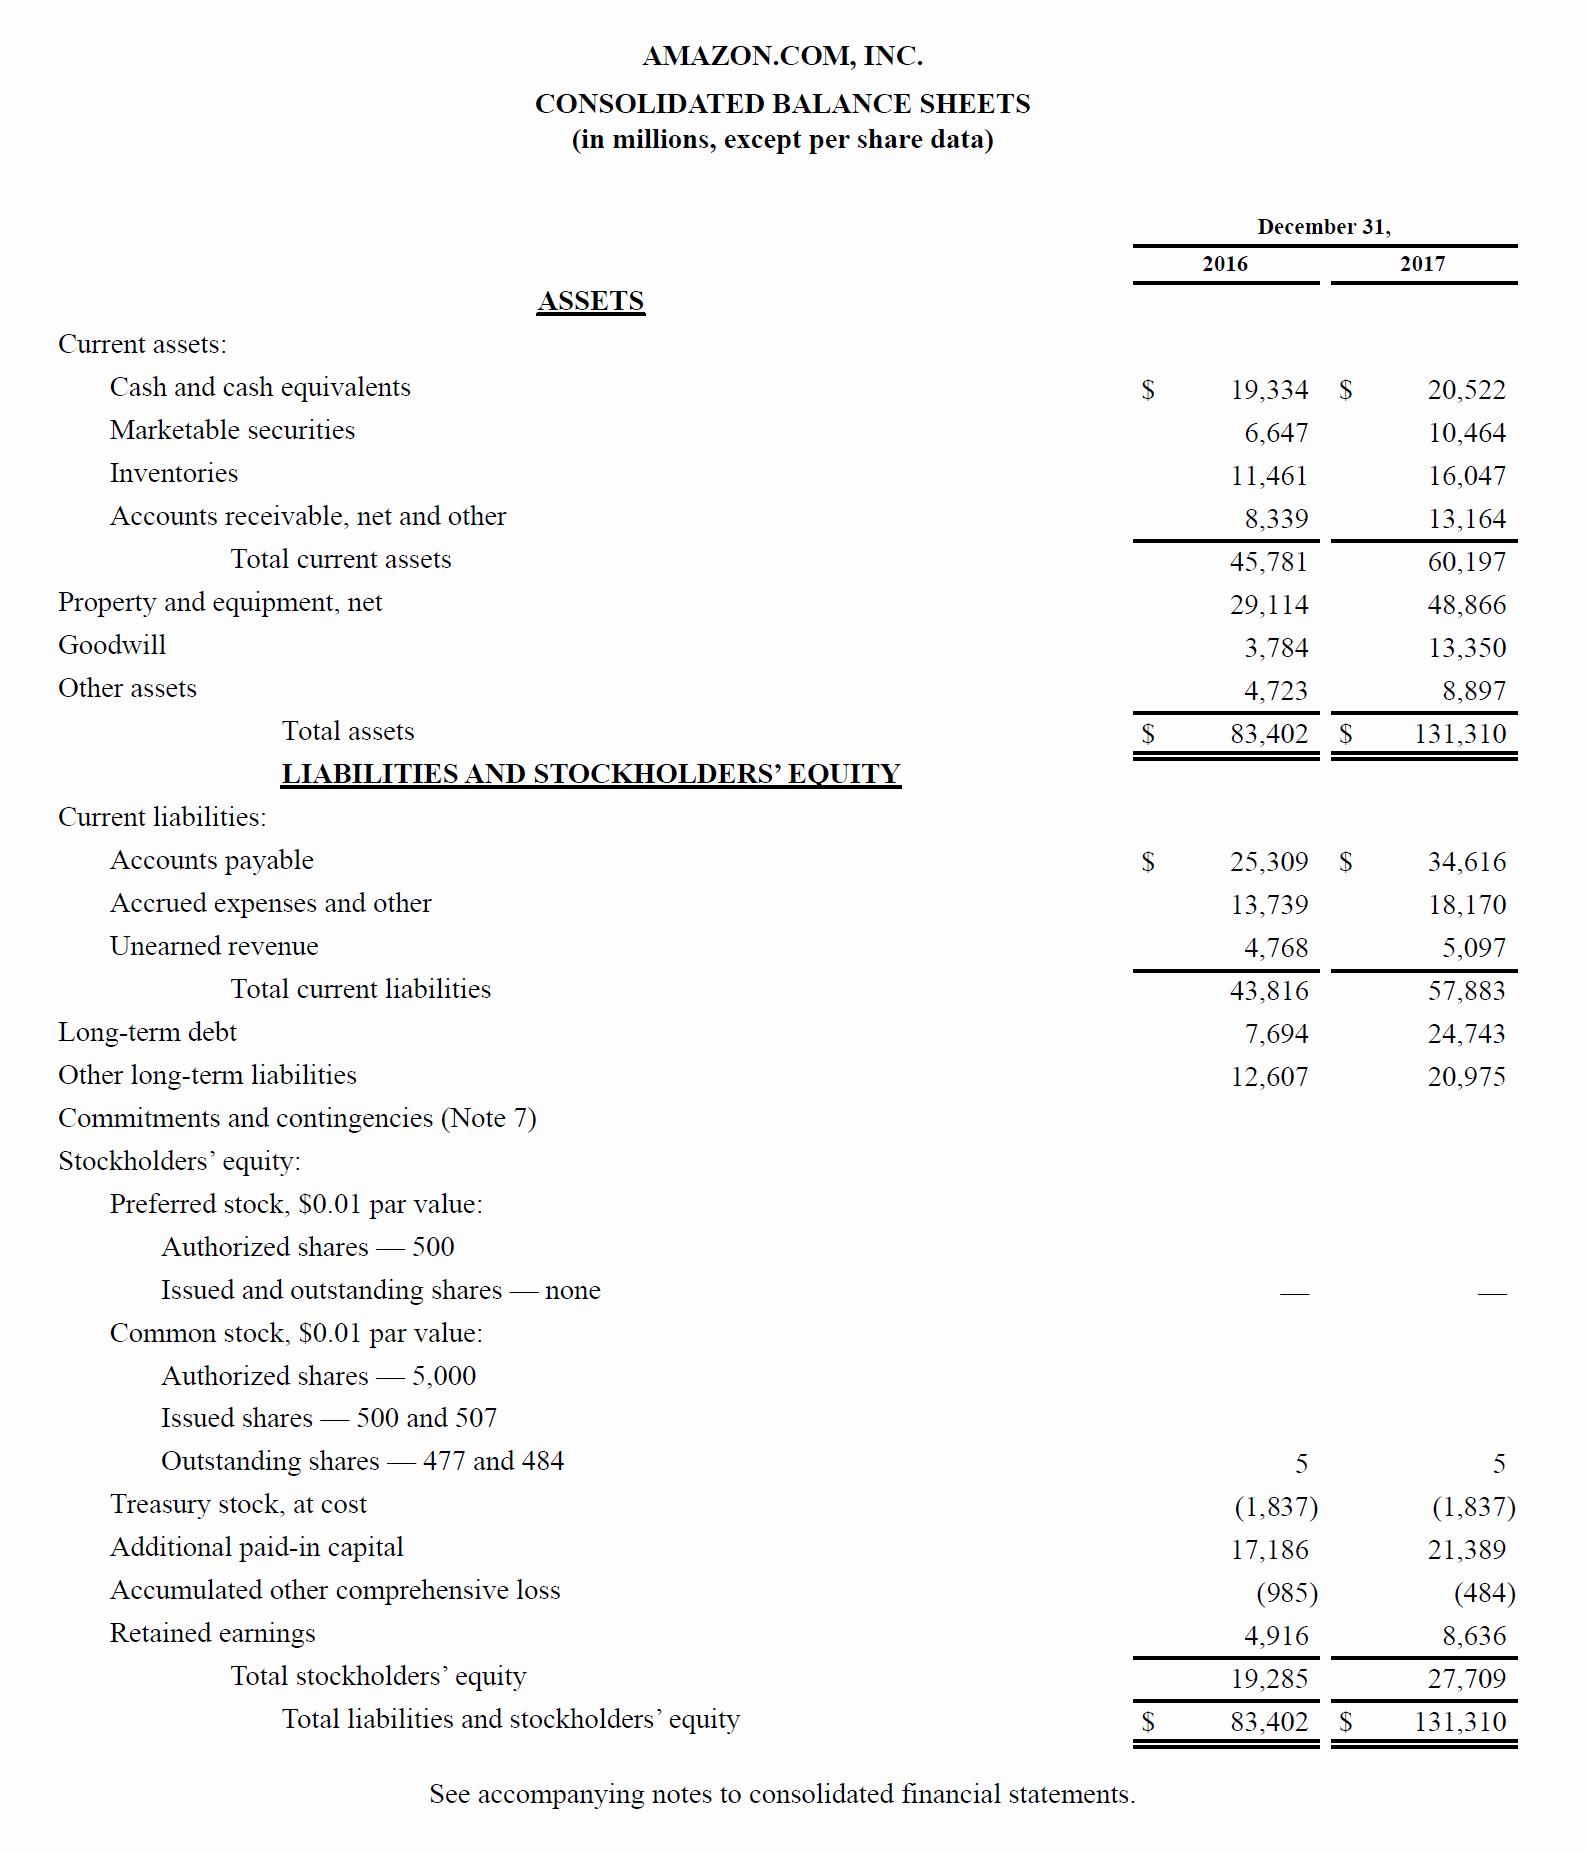 S Corp Balance Sheet Template Inspirational Balance Sheet Definition & Examples assets